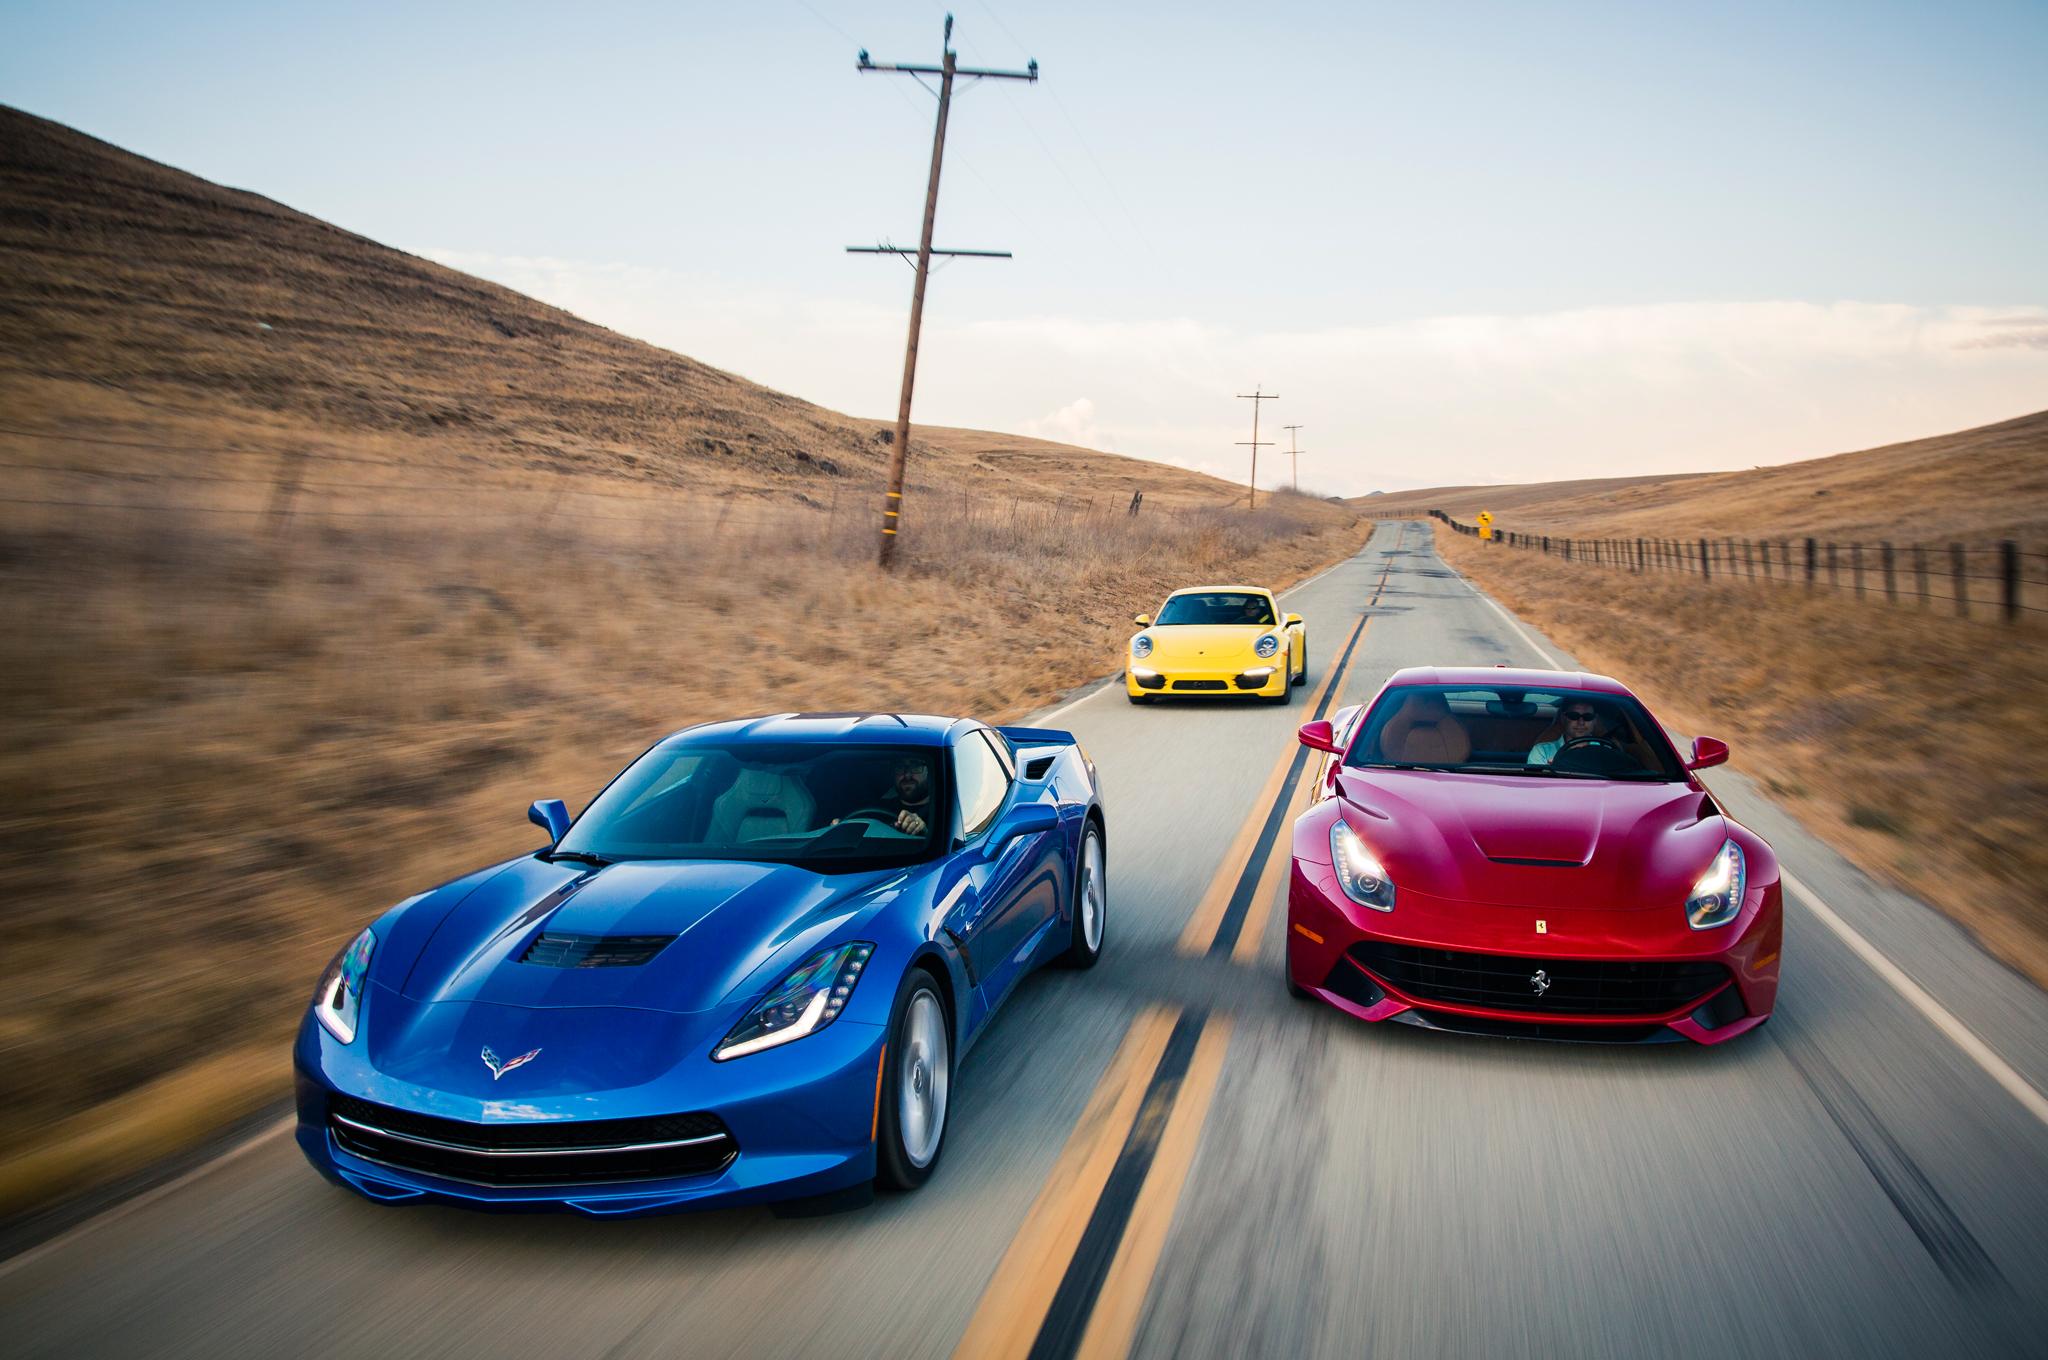 chevrolet-corvette-porsche-911-carrera-4s-ferrari-f12-berlinetta-front-end-03.jpg